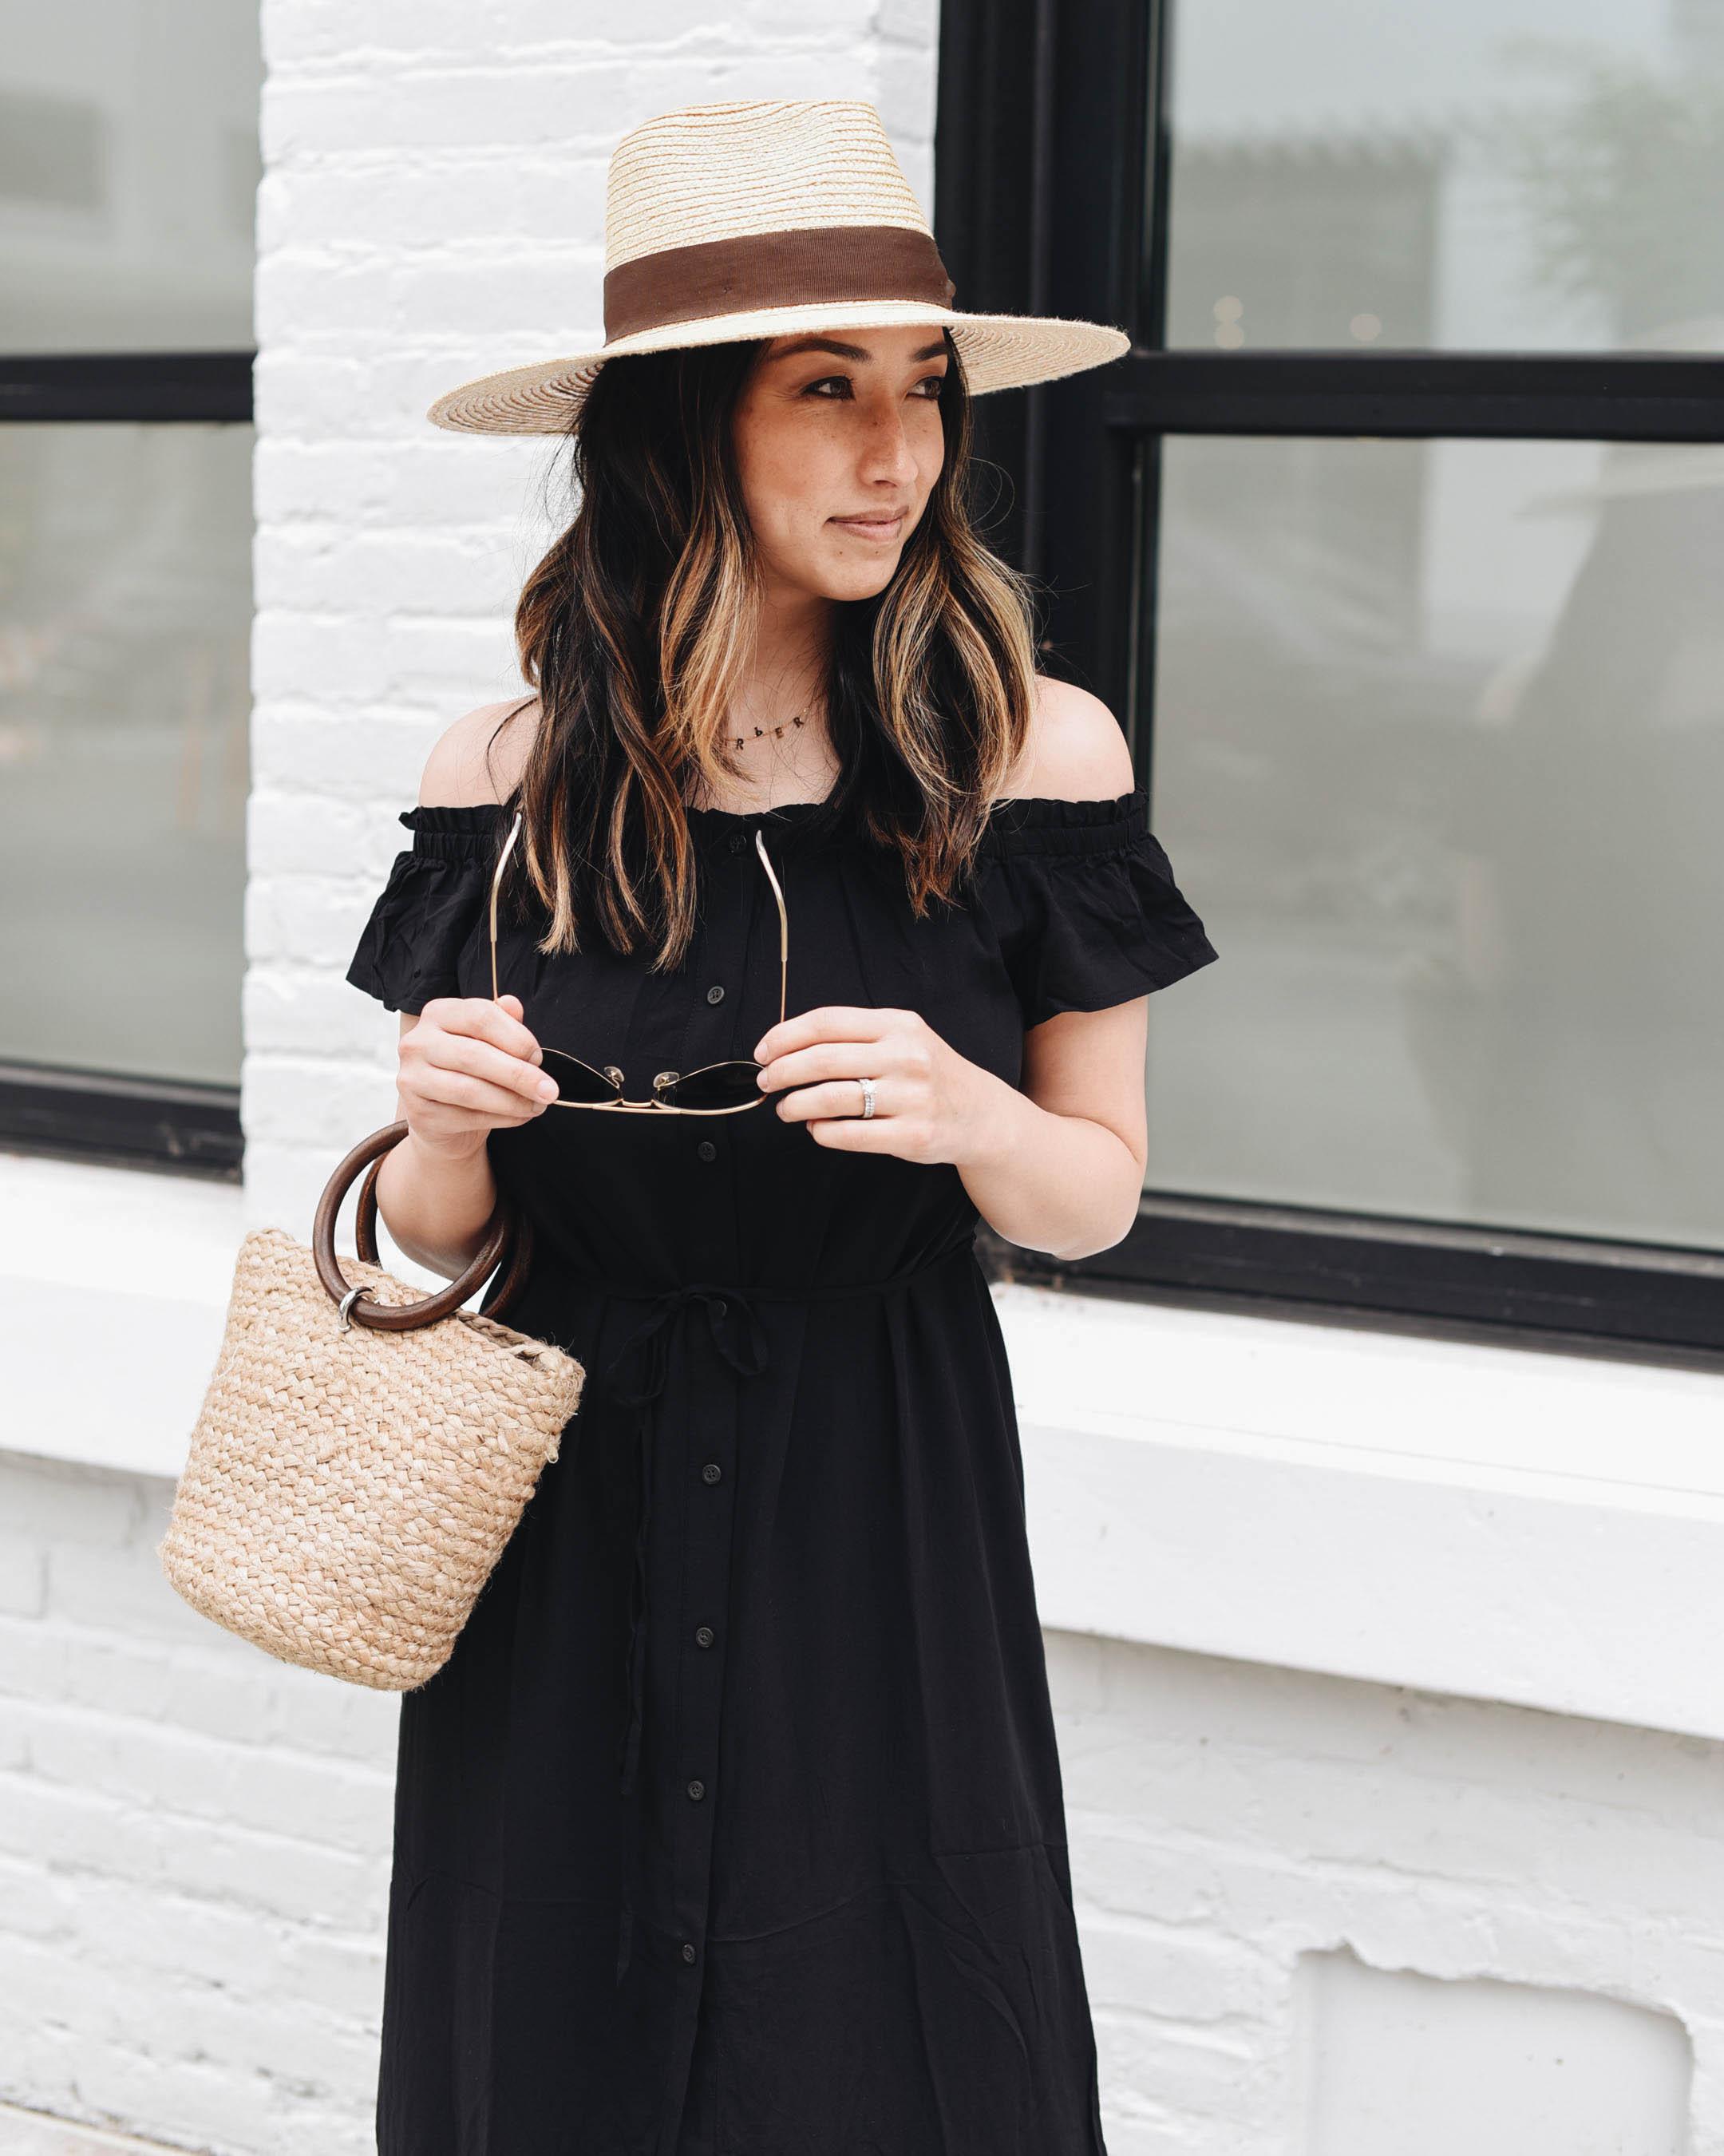 Black Dress social 3